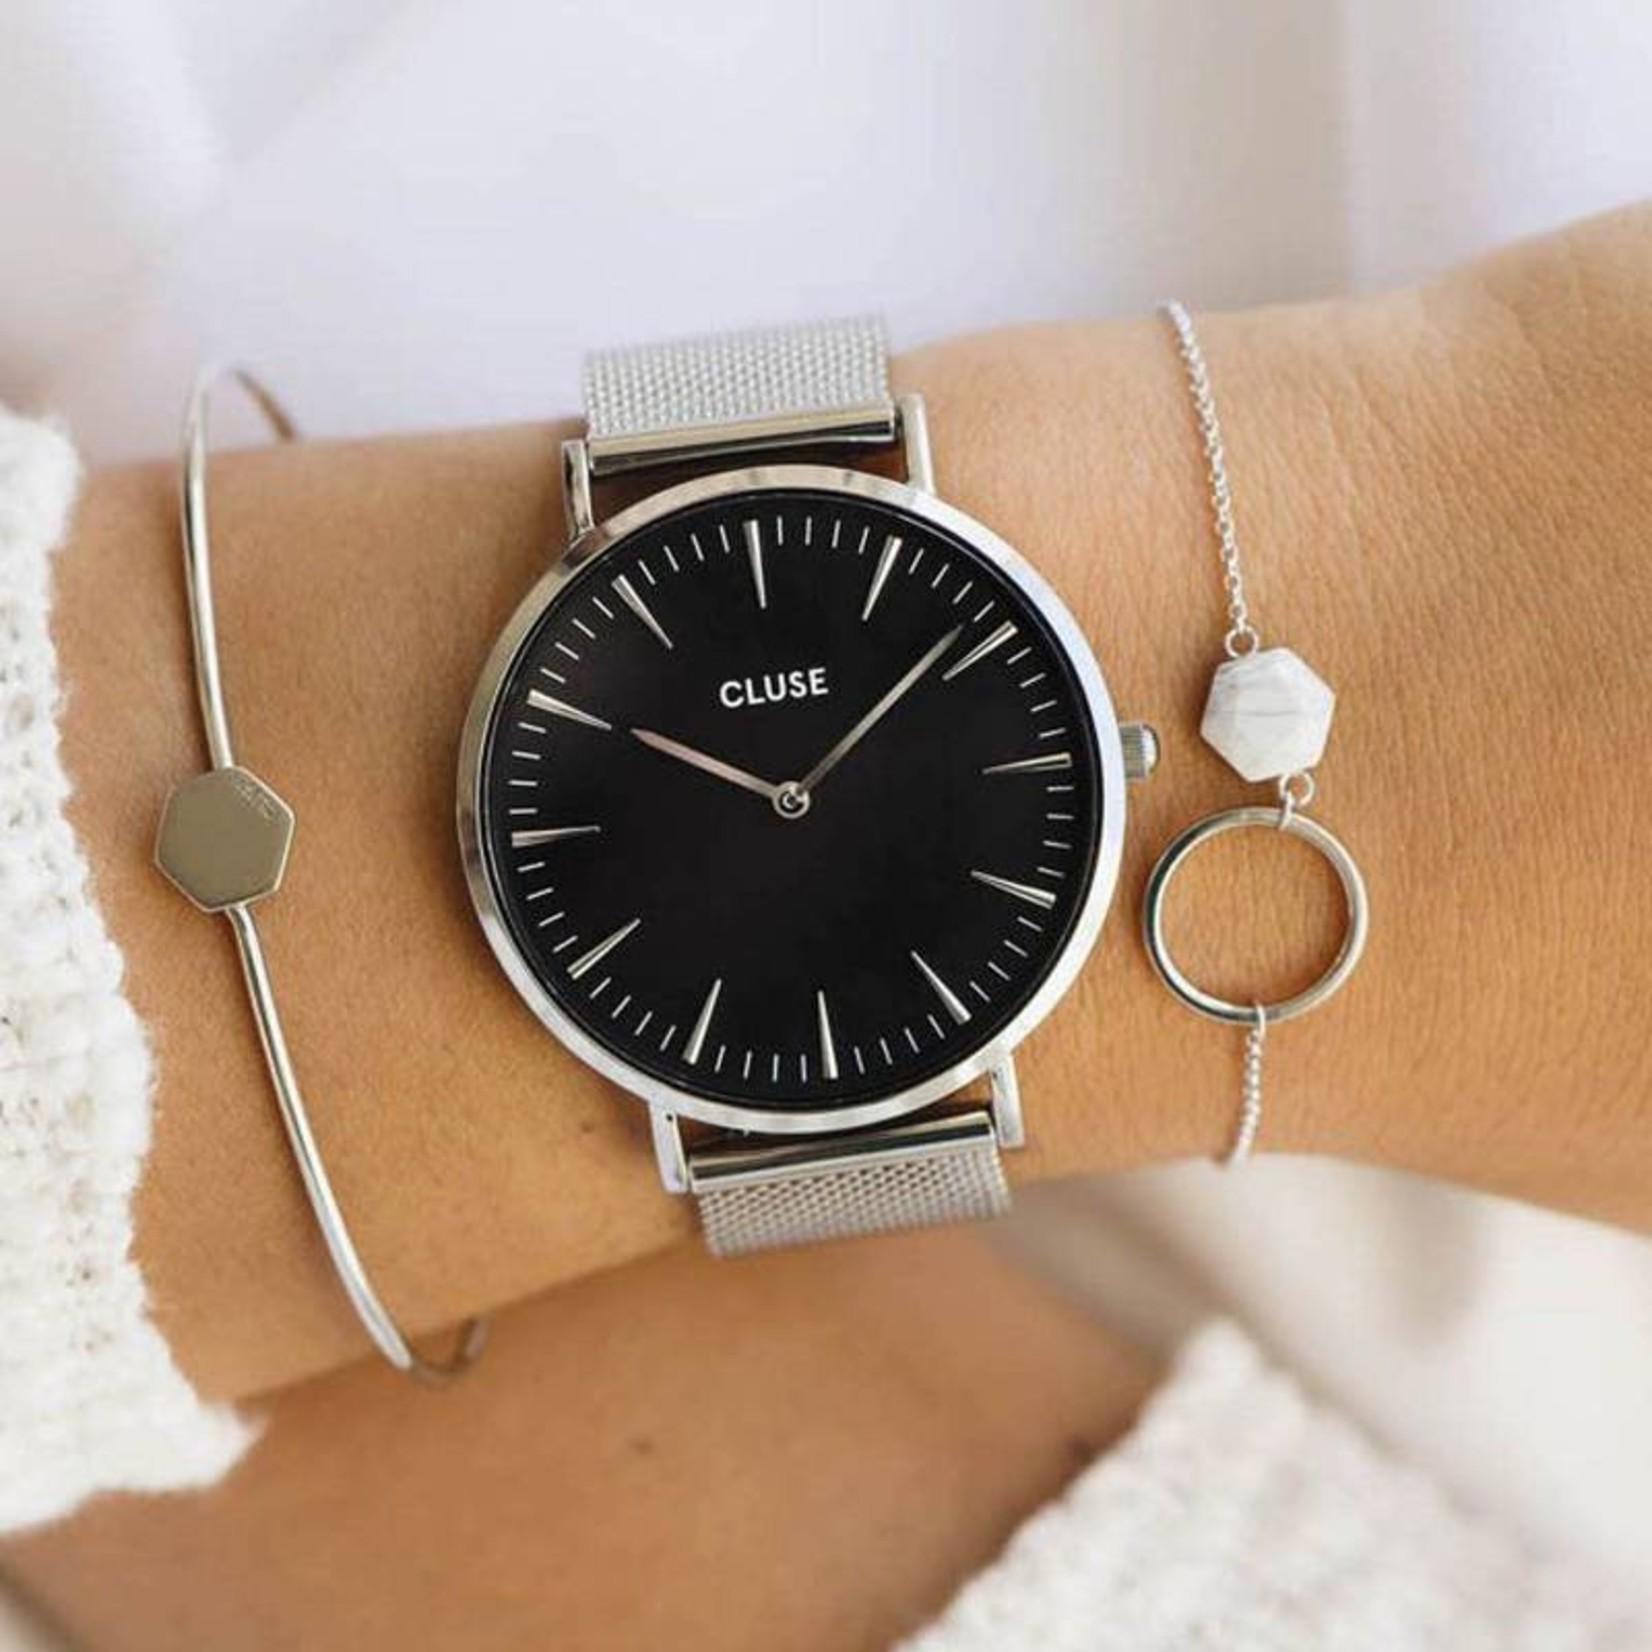 Cluse Cluse Uhr La Bohème silber-schwarz I Mesh silber